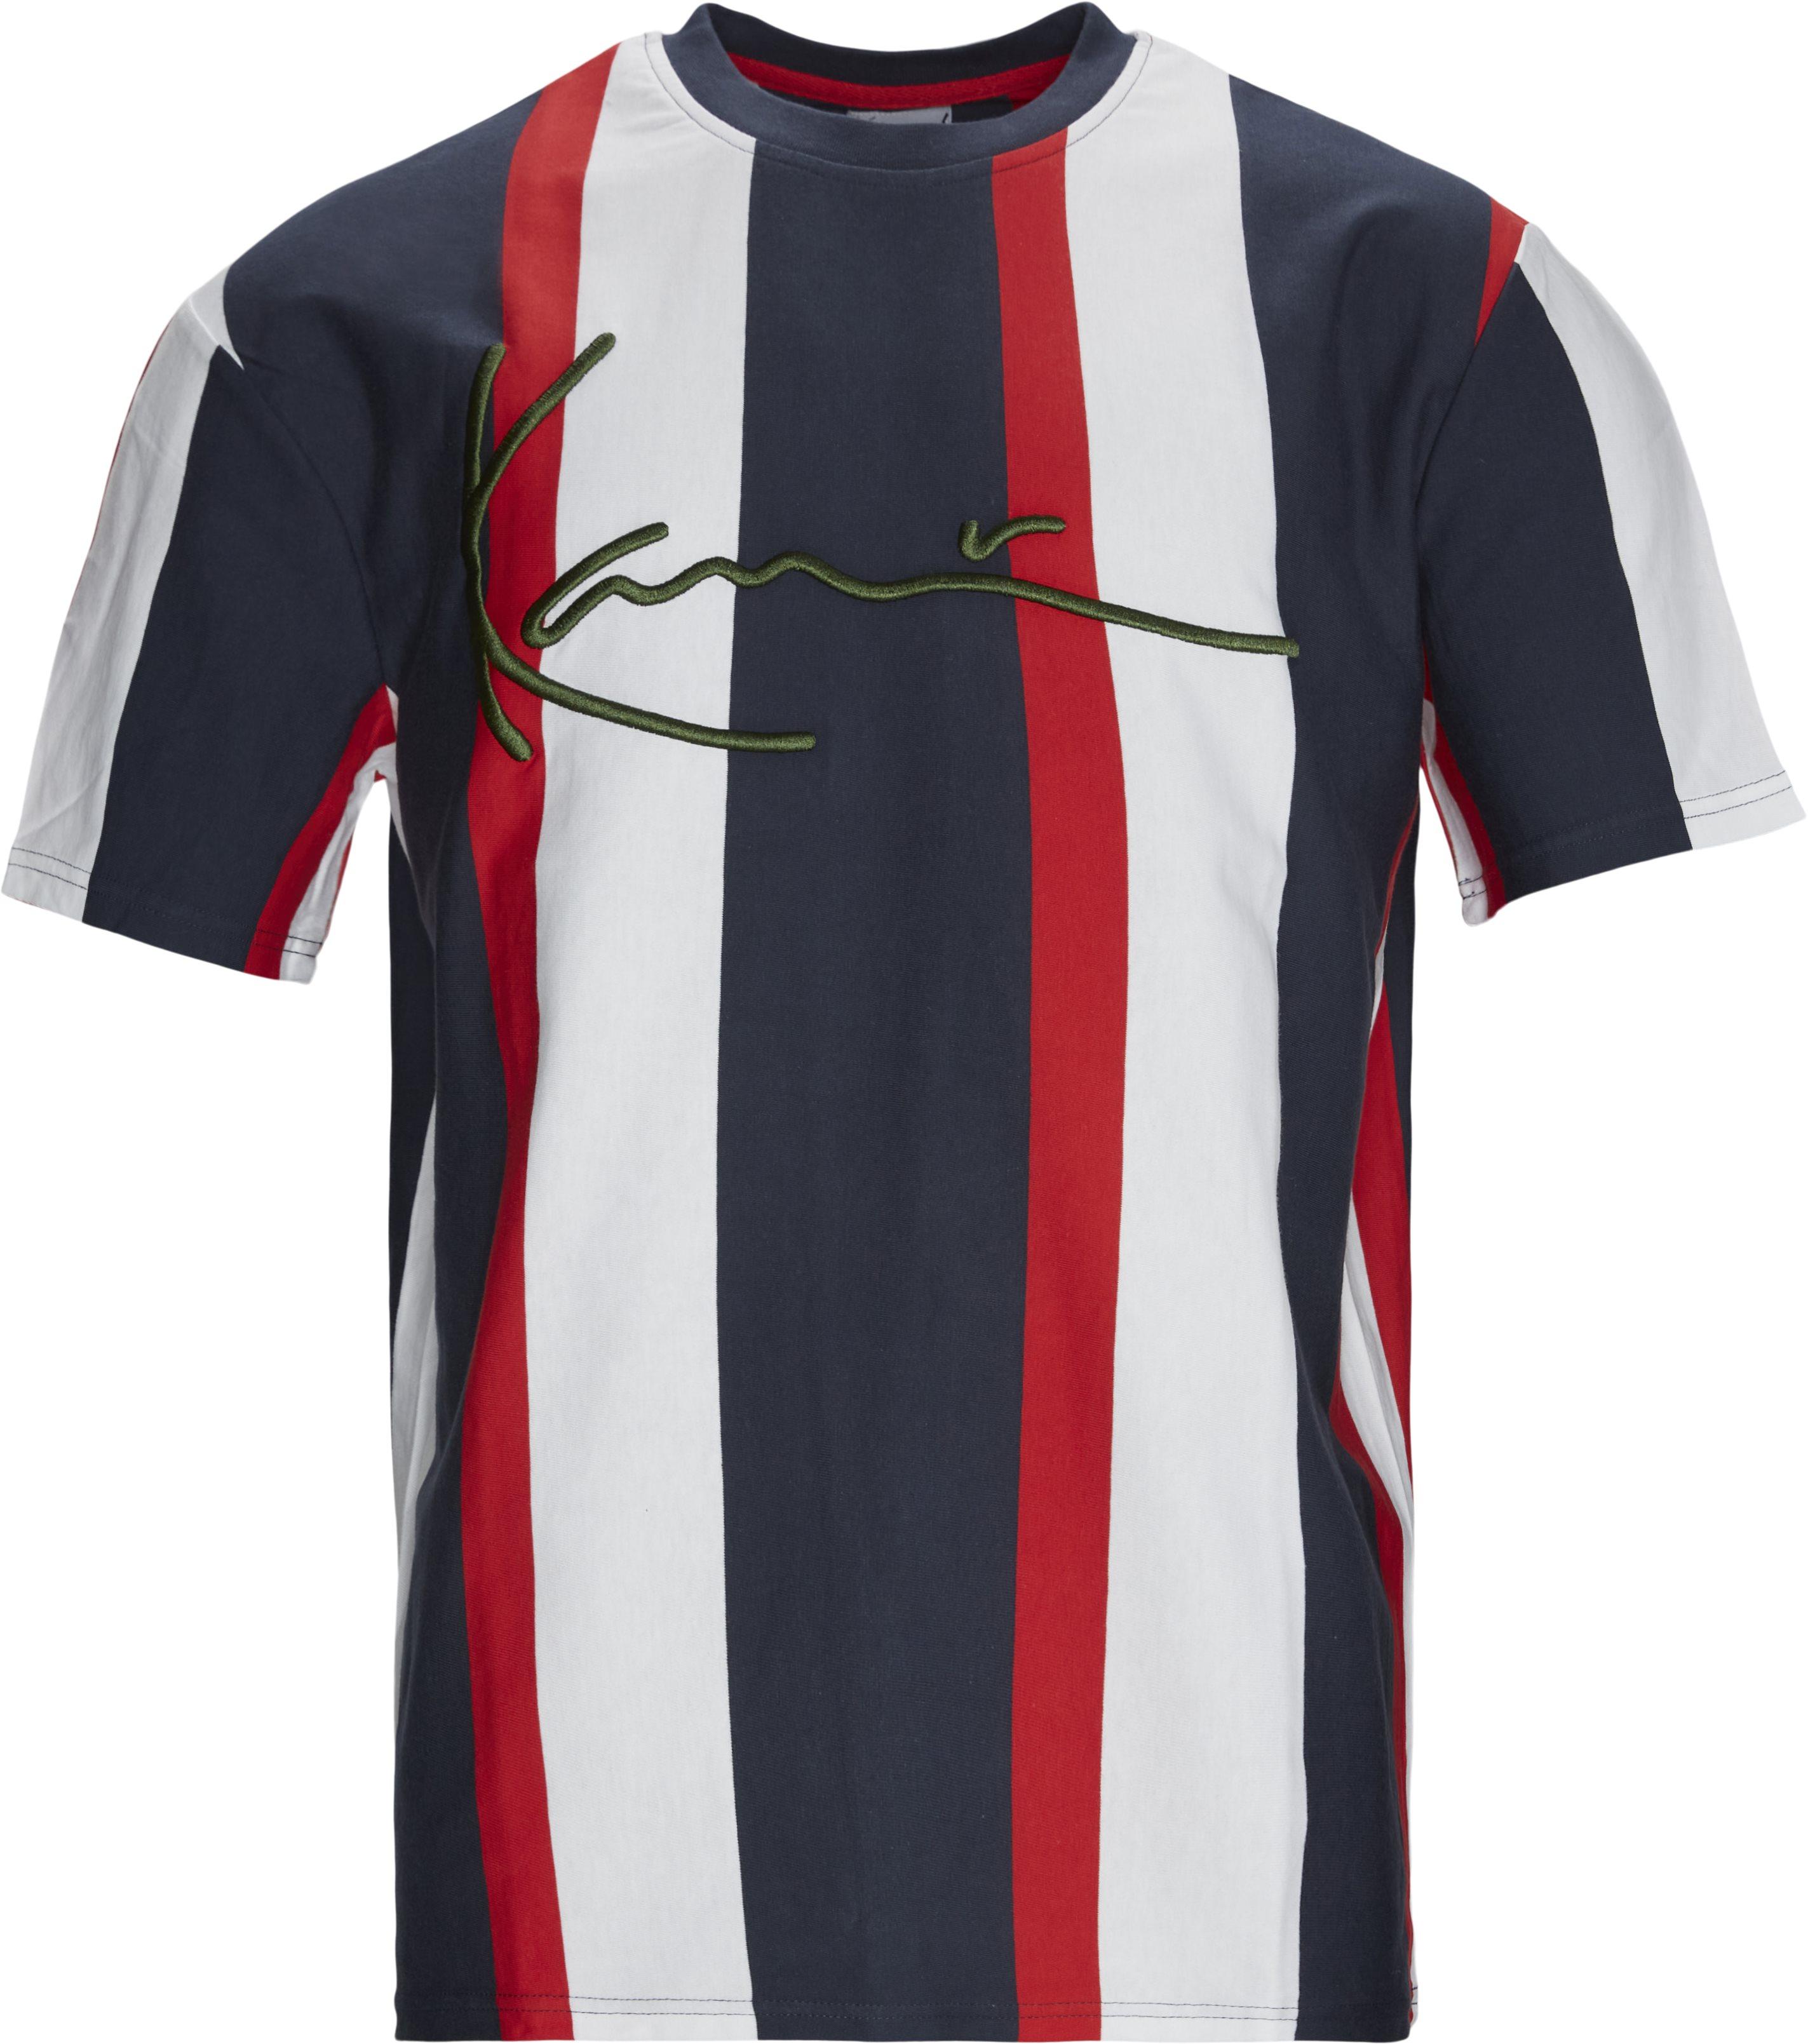 SIGNATURE STRIPE Tee - T-shirts - Regular fit - Blå